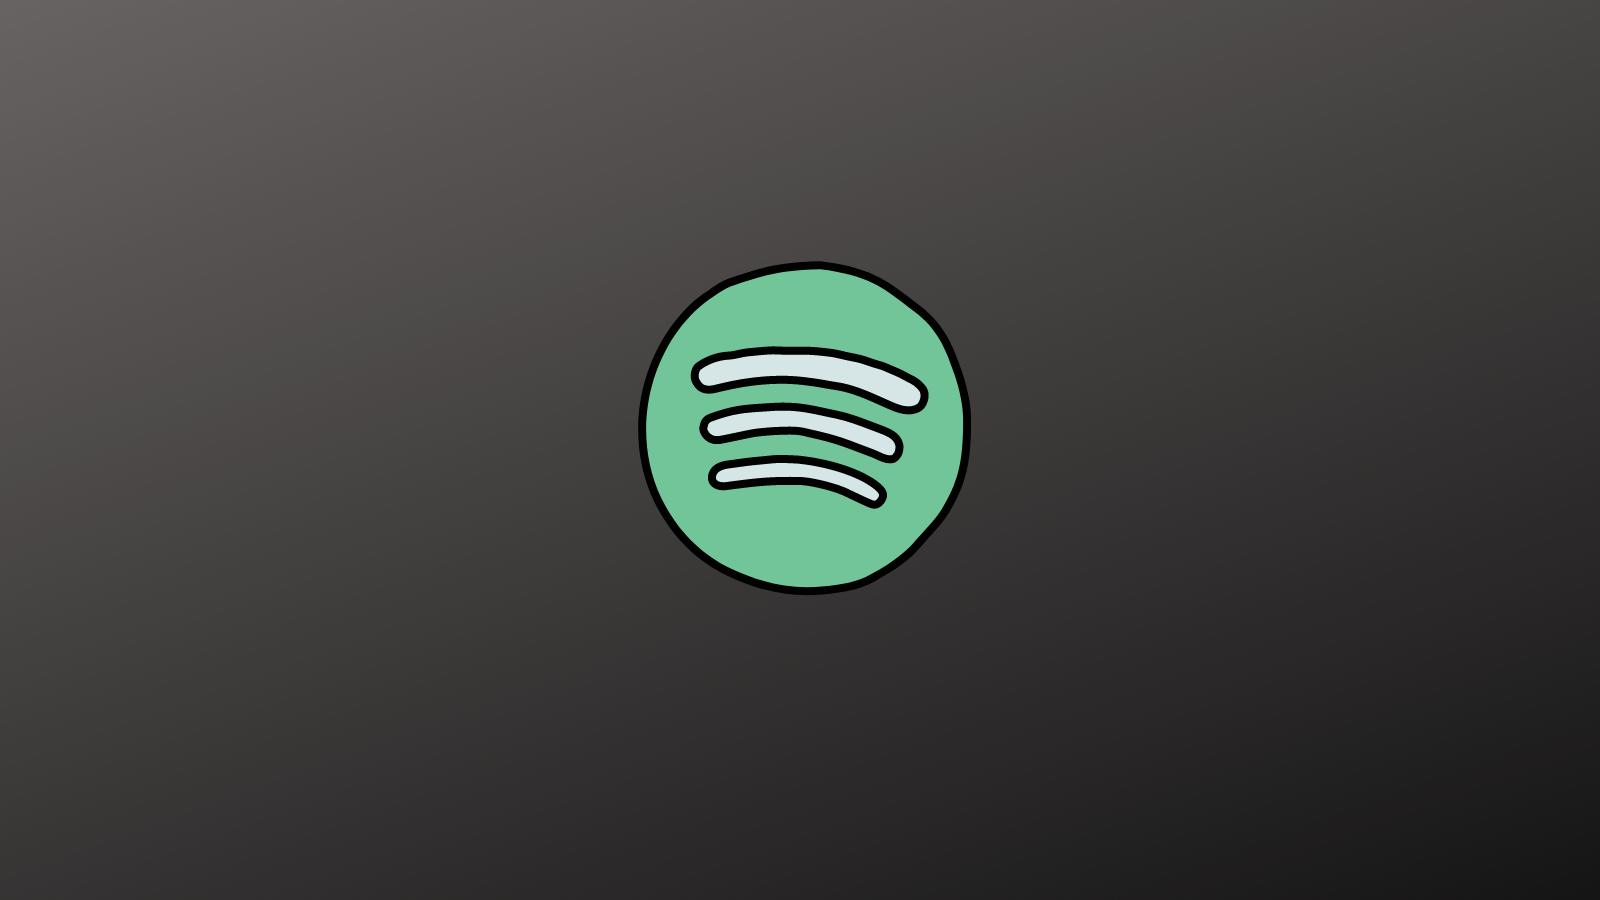 How To Cancel Spotify Premium?